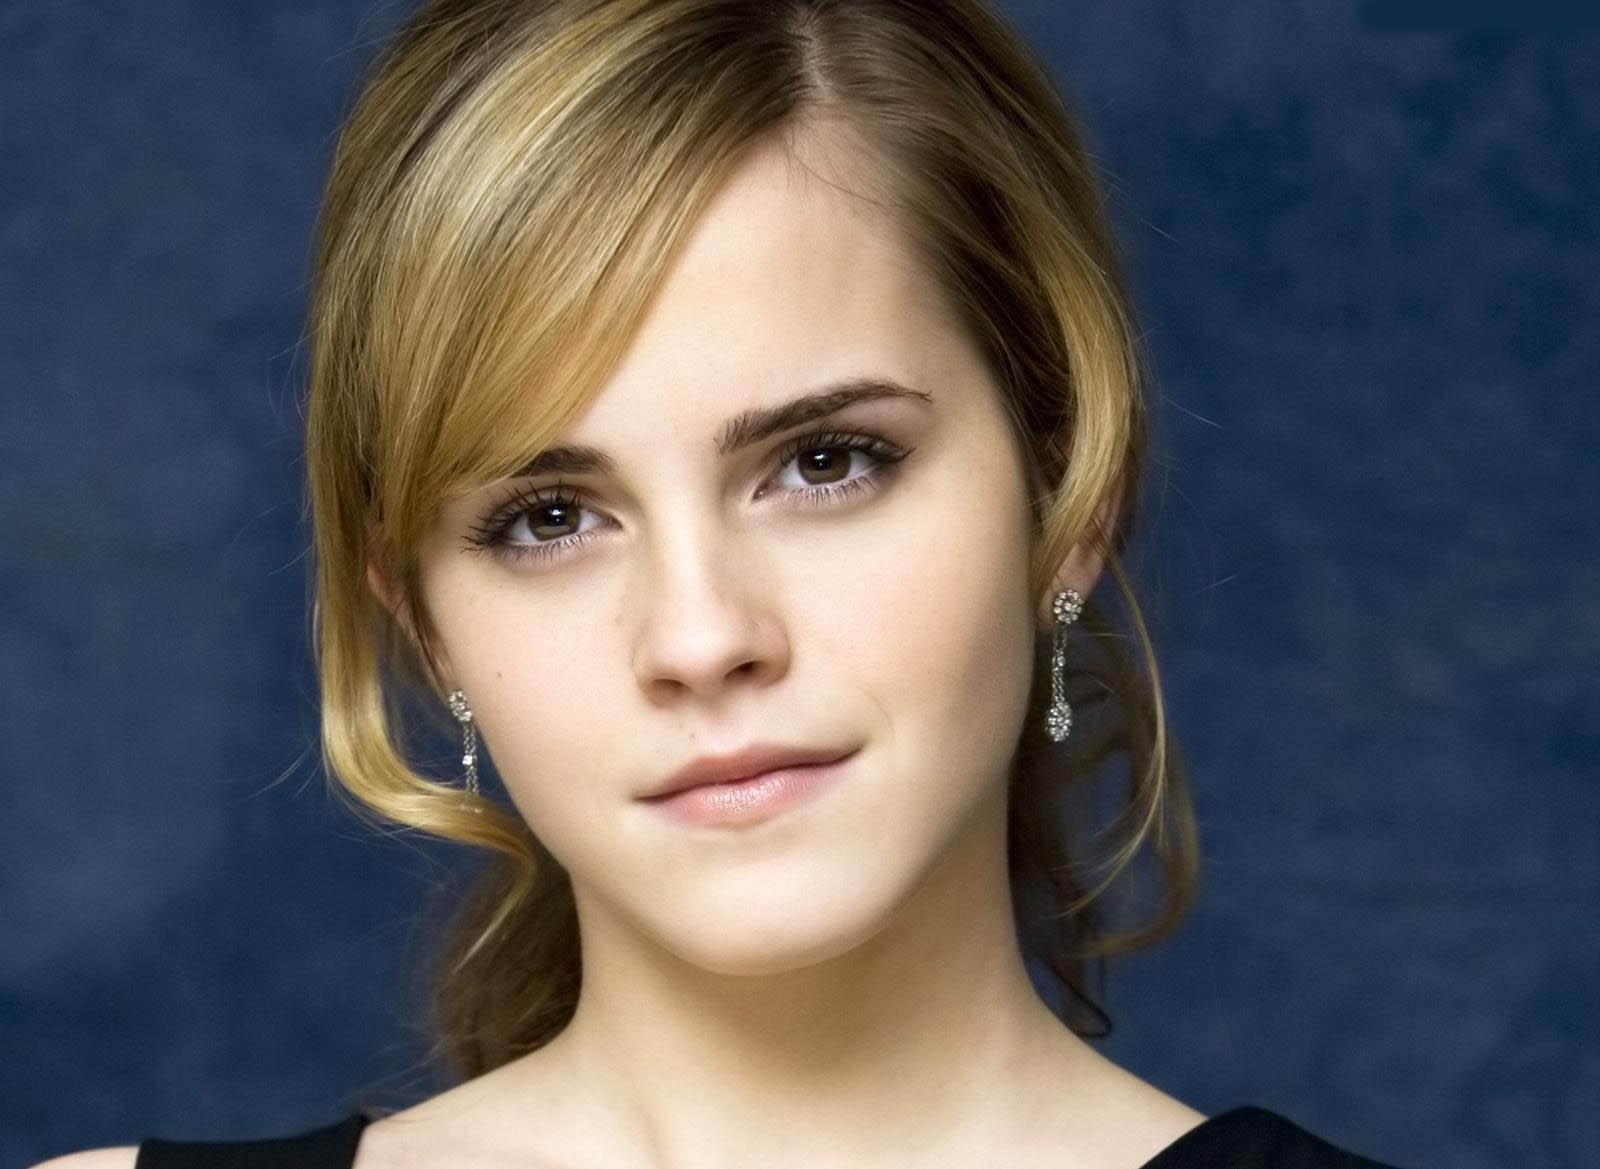 Emma Watson Best Hollywood Actress Sheclick Com